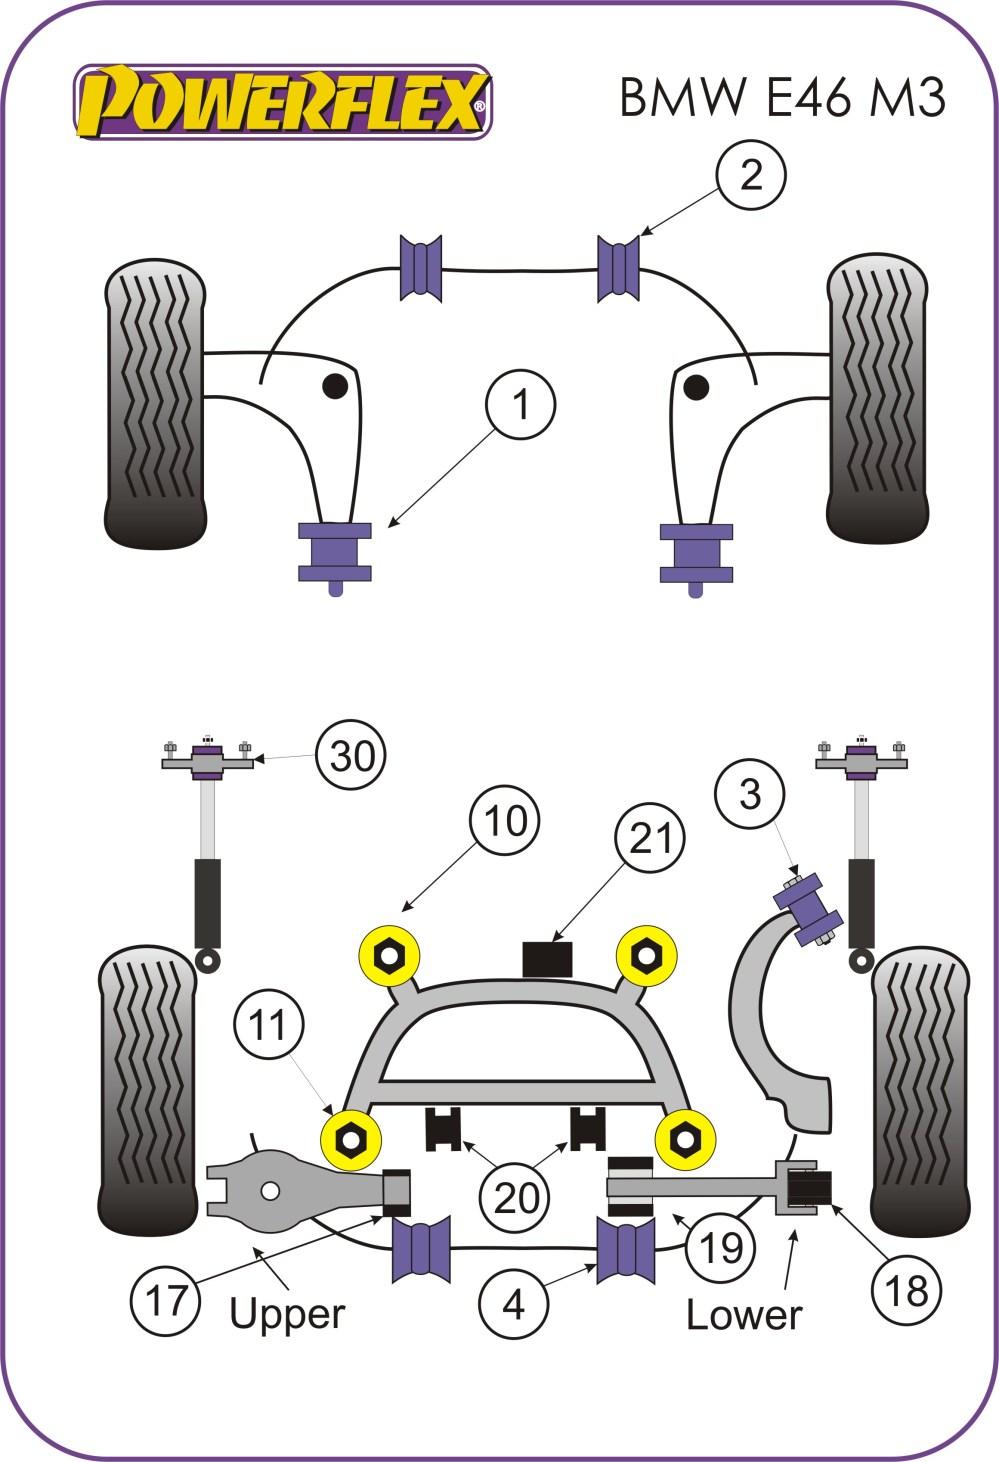 medium resolution of powerflex bmw e46 m3 diagram